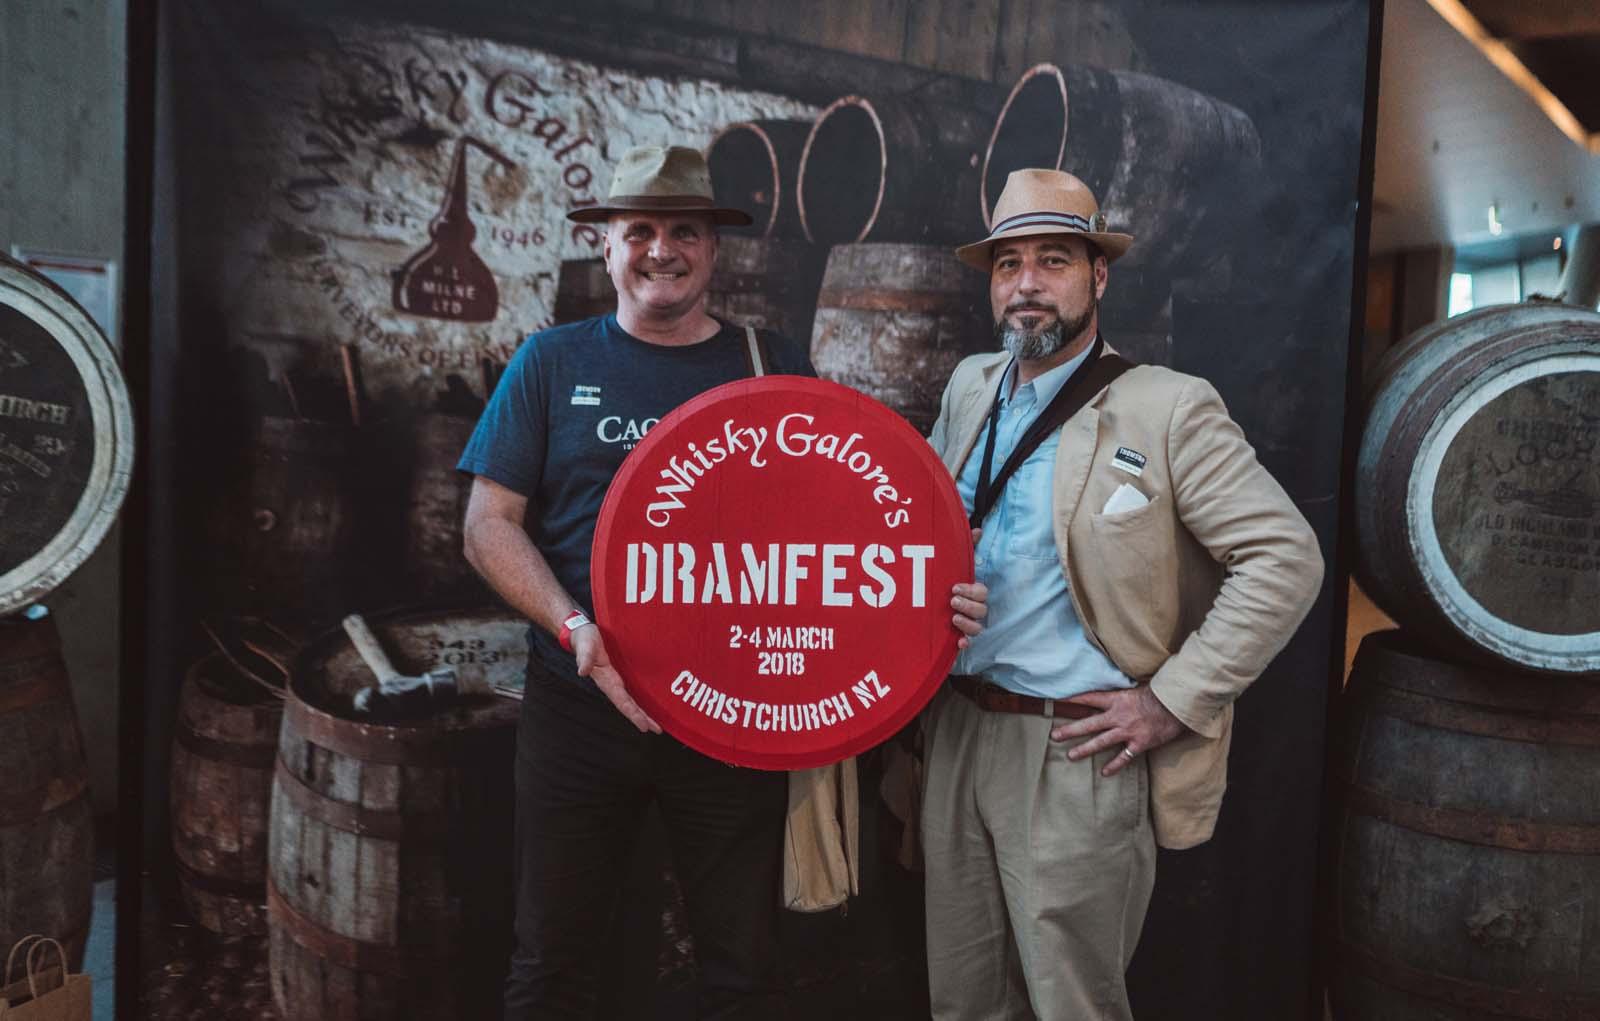 Dramfest 2018 for Whisky Galore-154.jpg